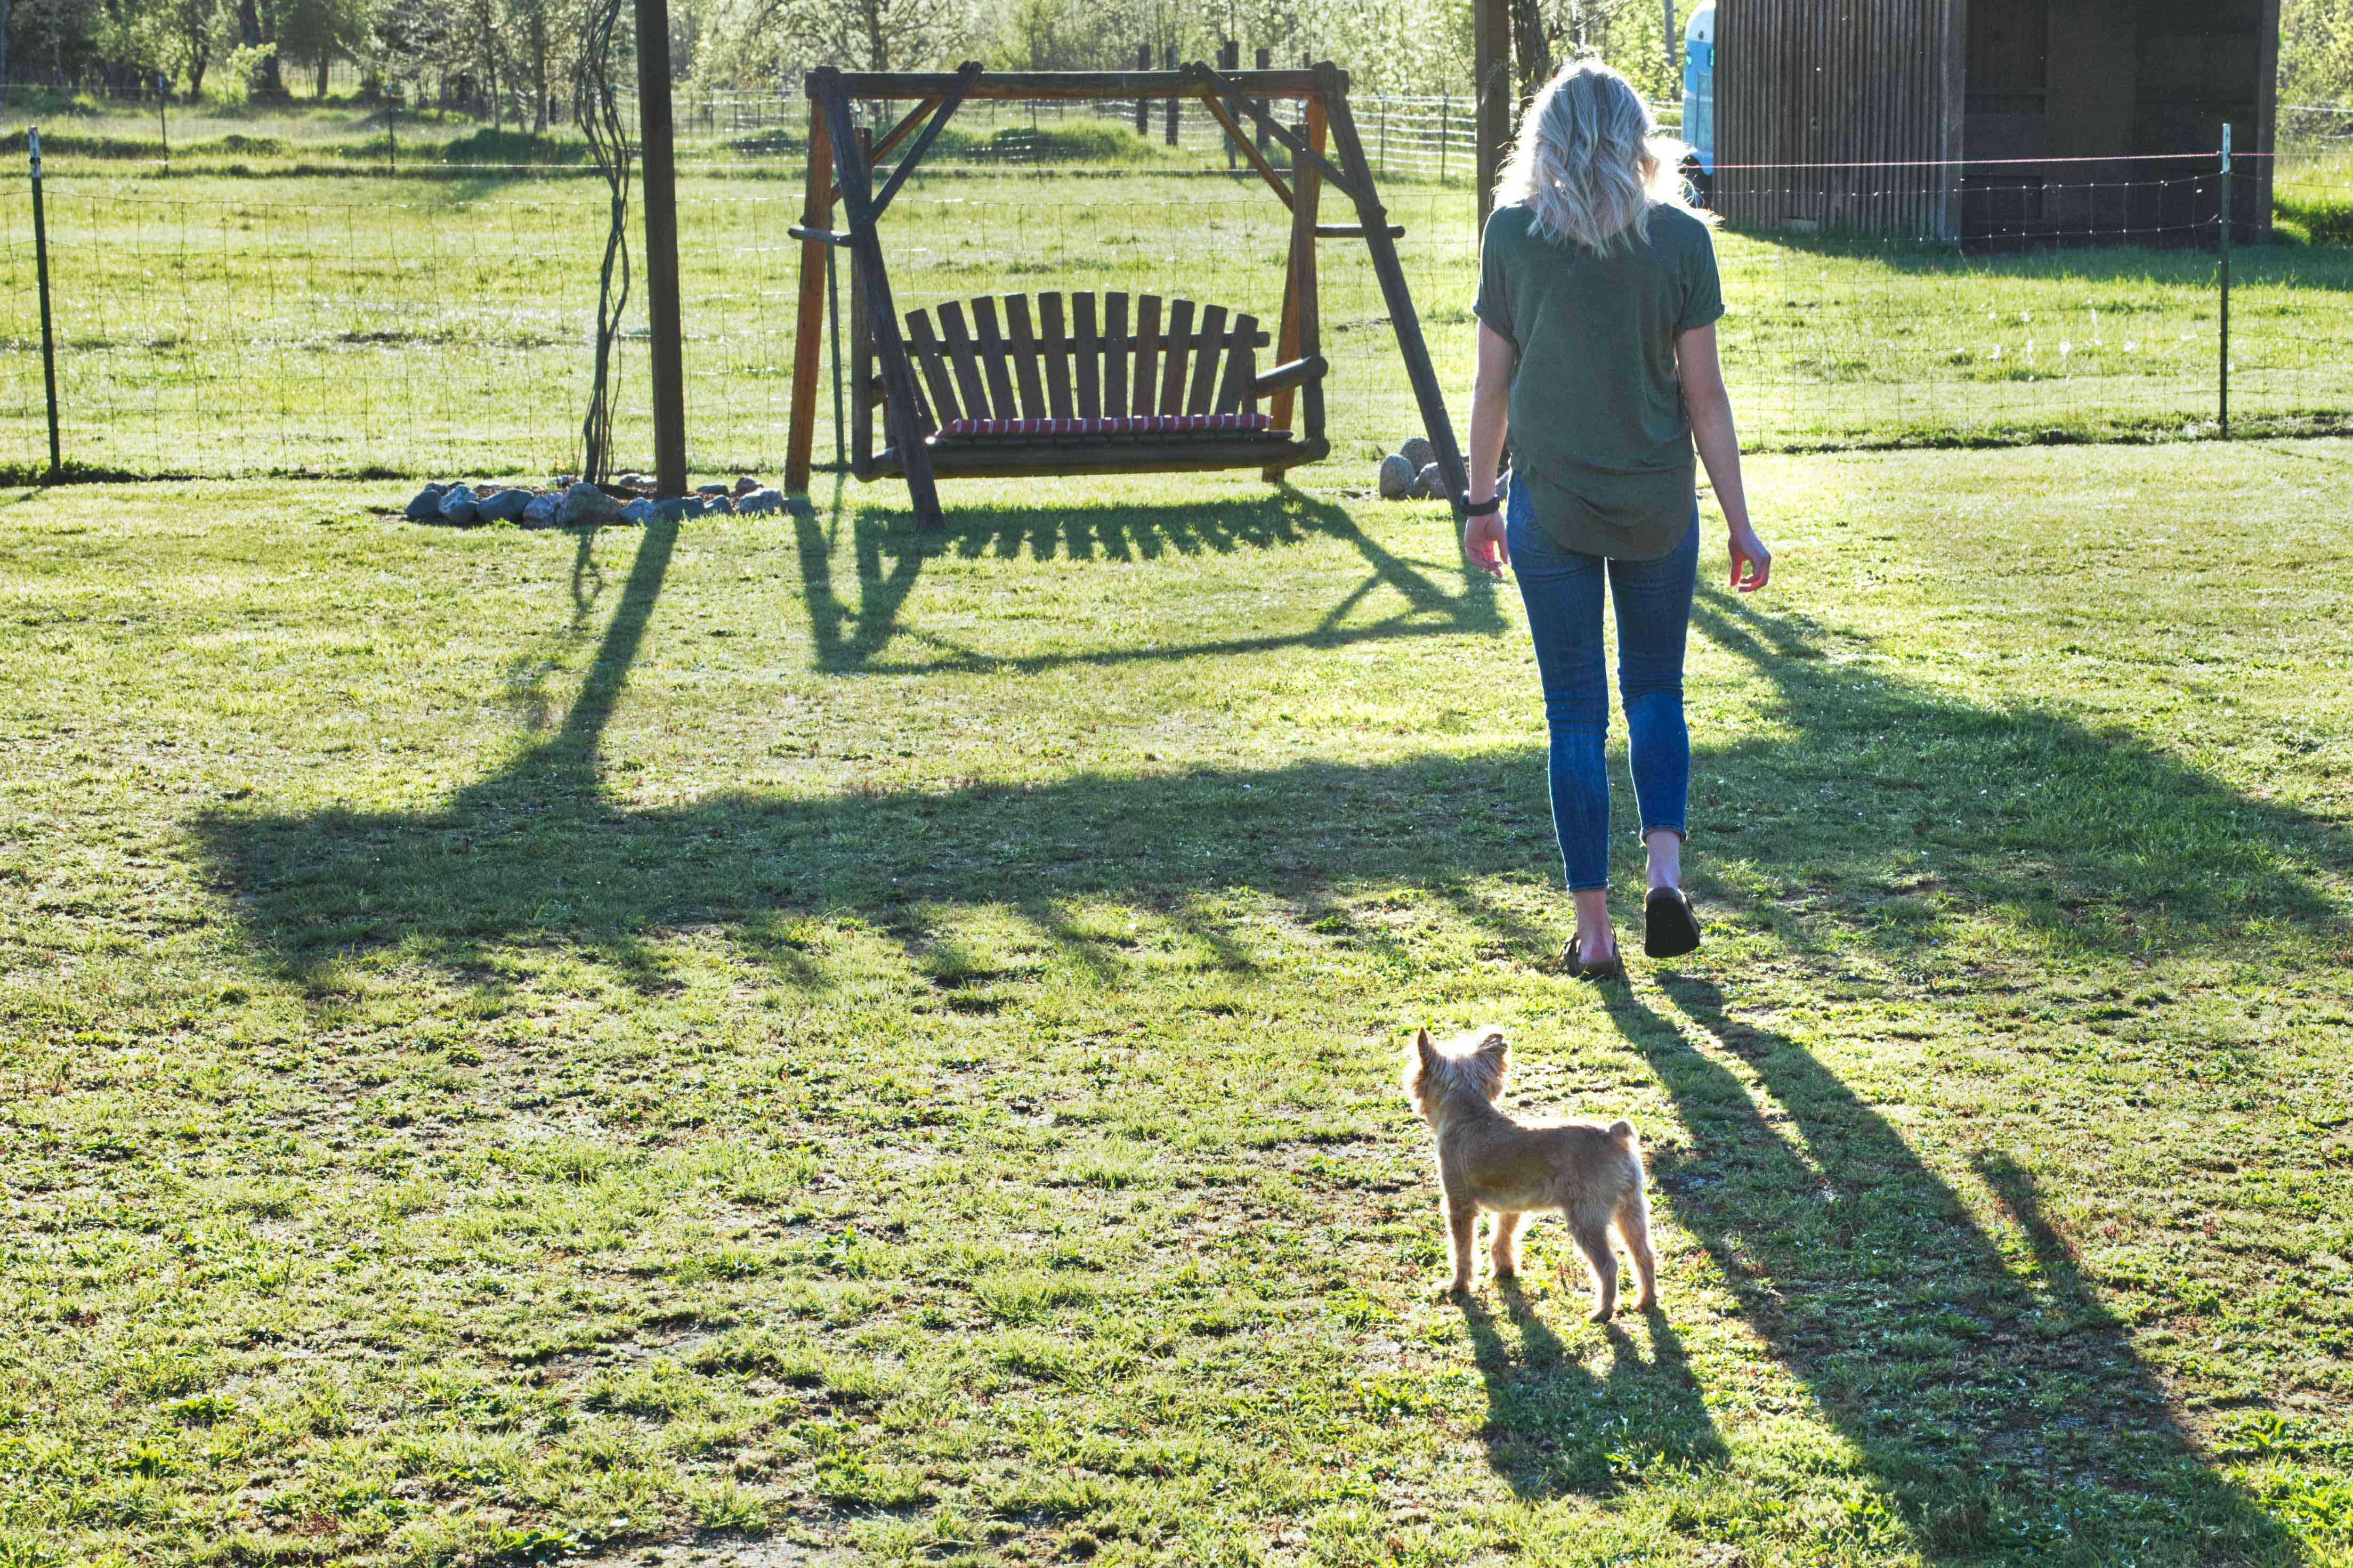 little dog follows woman owner outside to lawn swing in yard